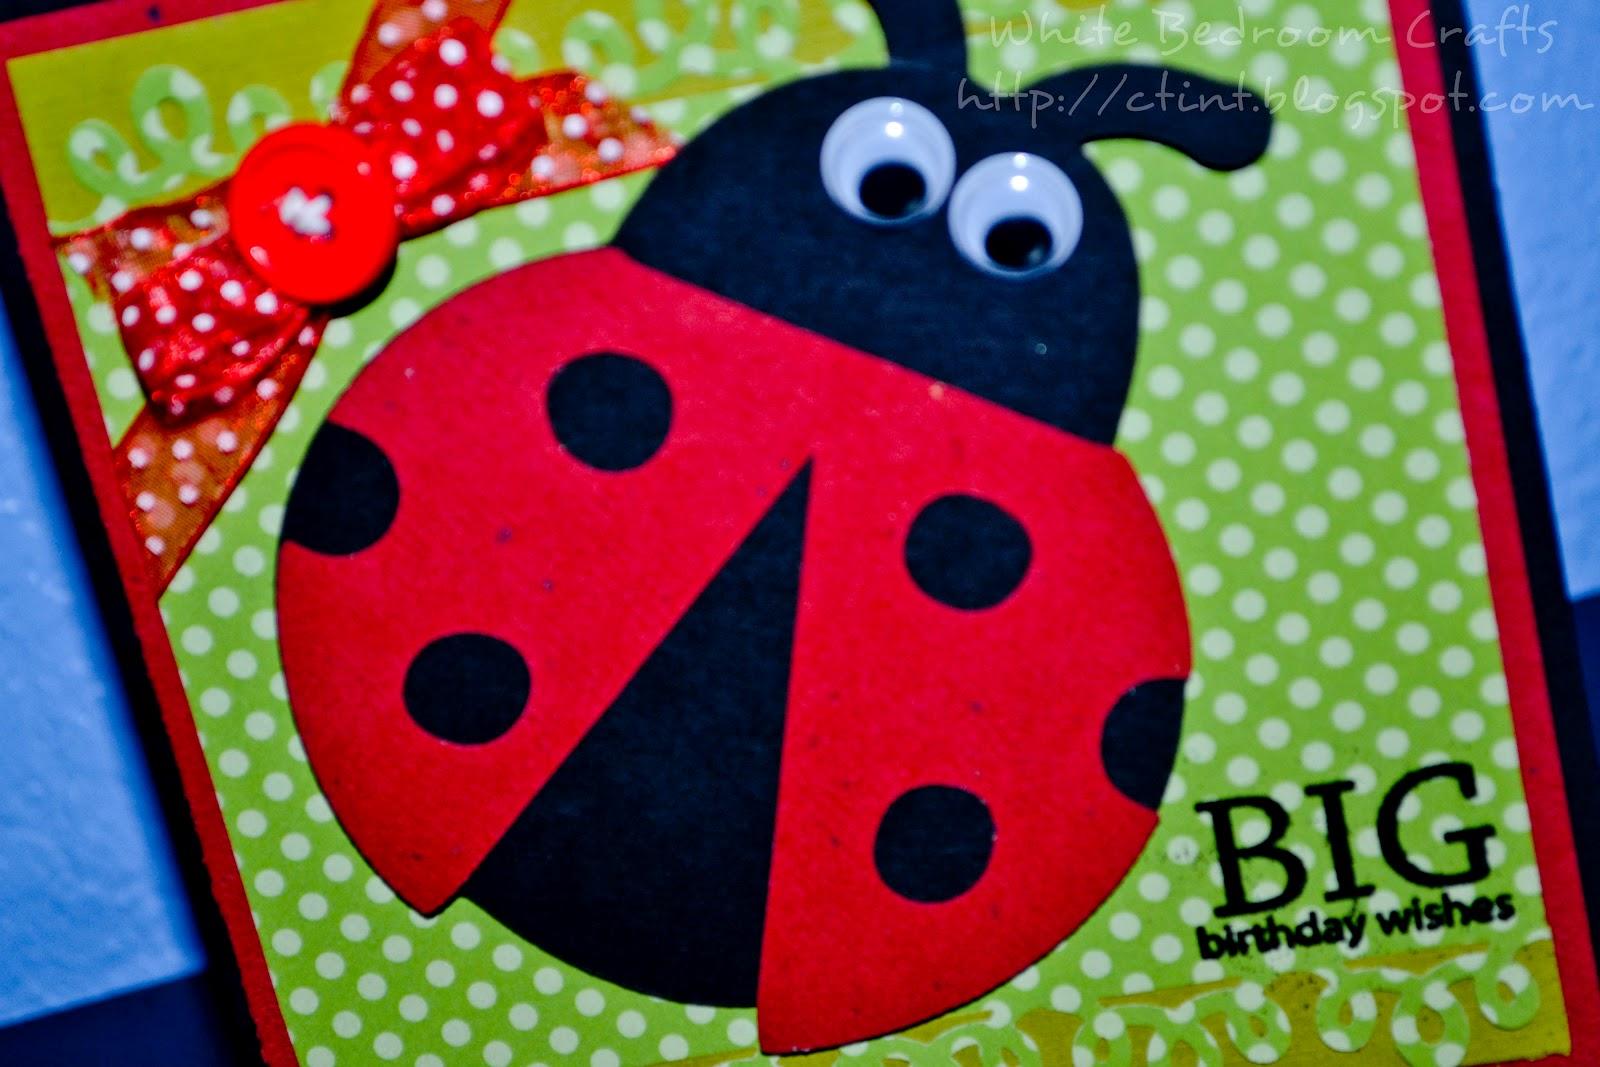 Ladybug Bedroom White Bedroom Crafts Lady Bug Birthday Wishes